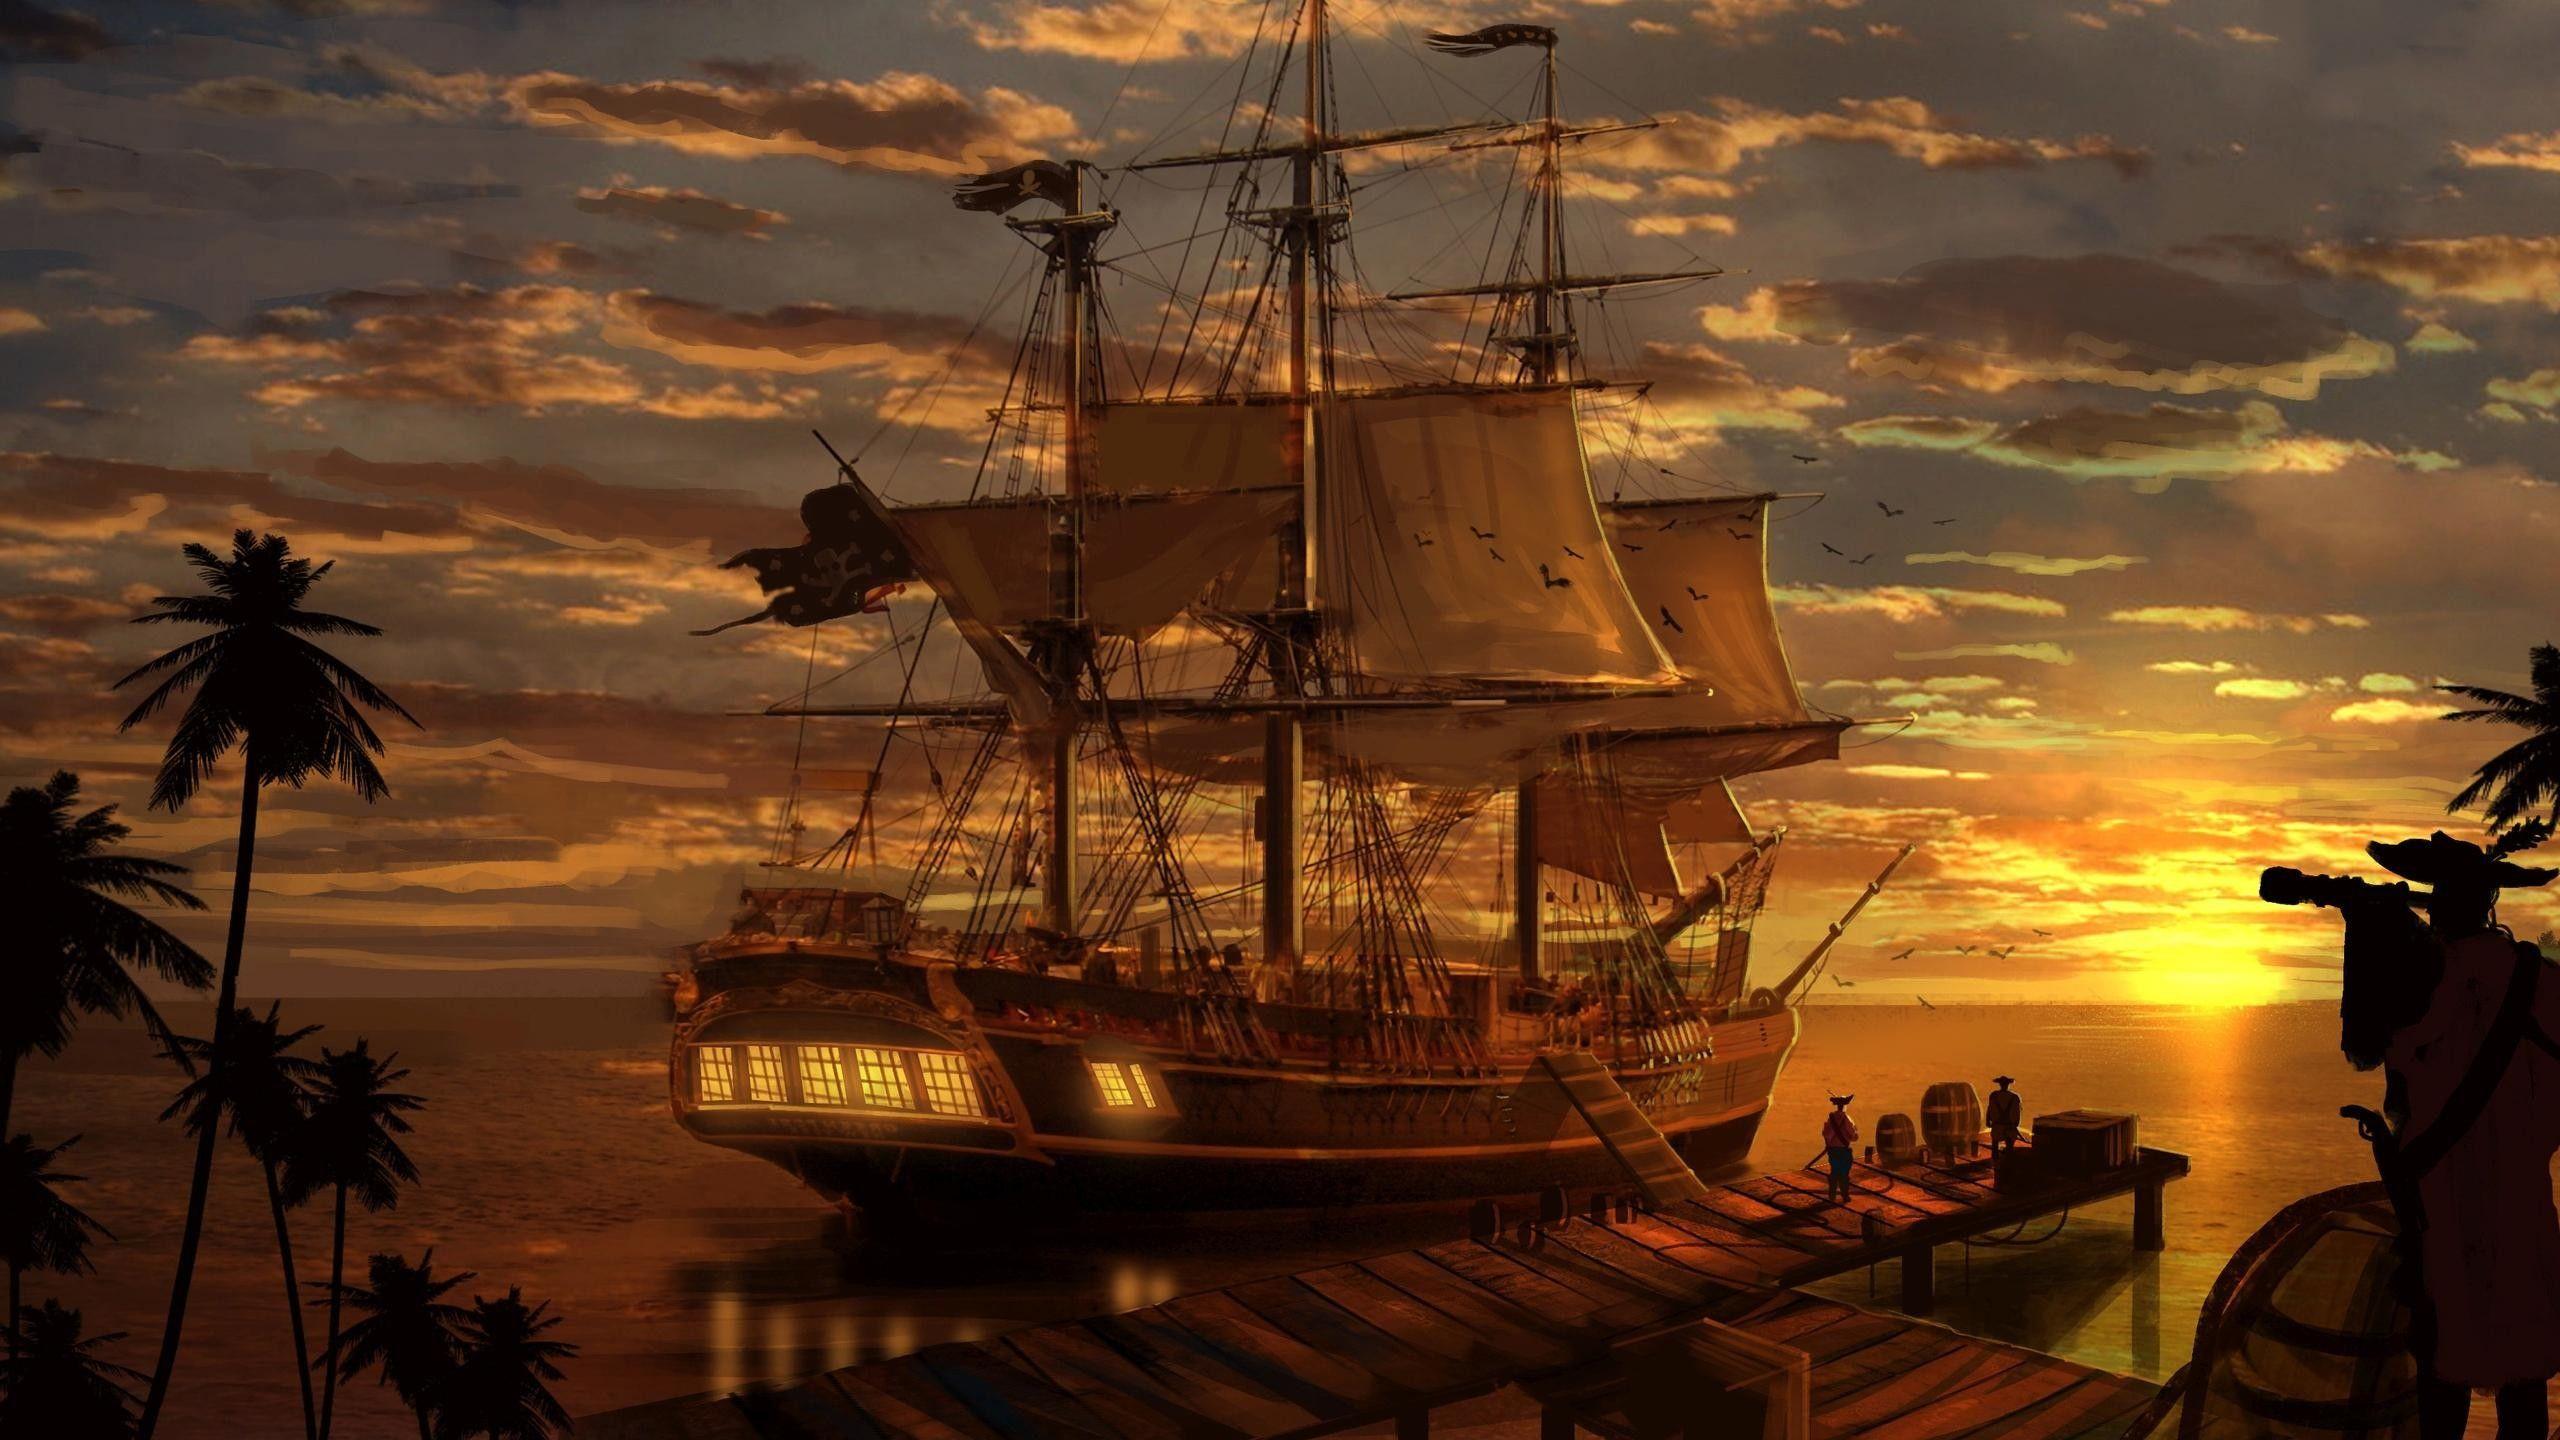 Pirate Ship Wallpaper Hd Resolution On Wallpaper 1080p HD 2560x1440